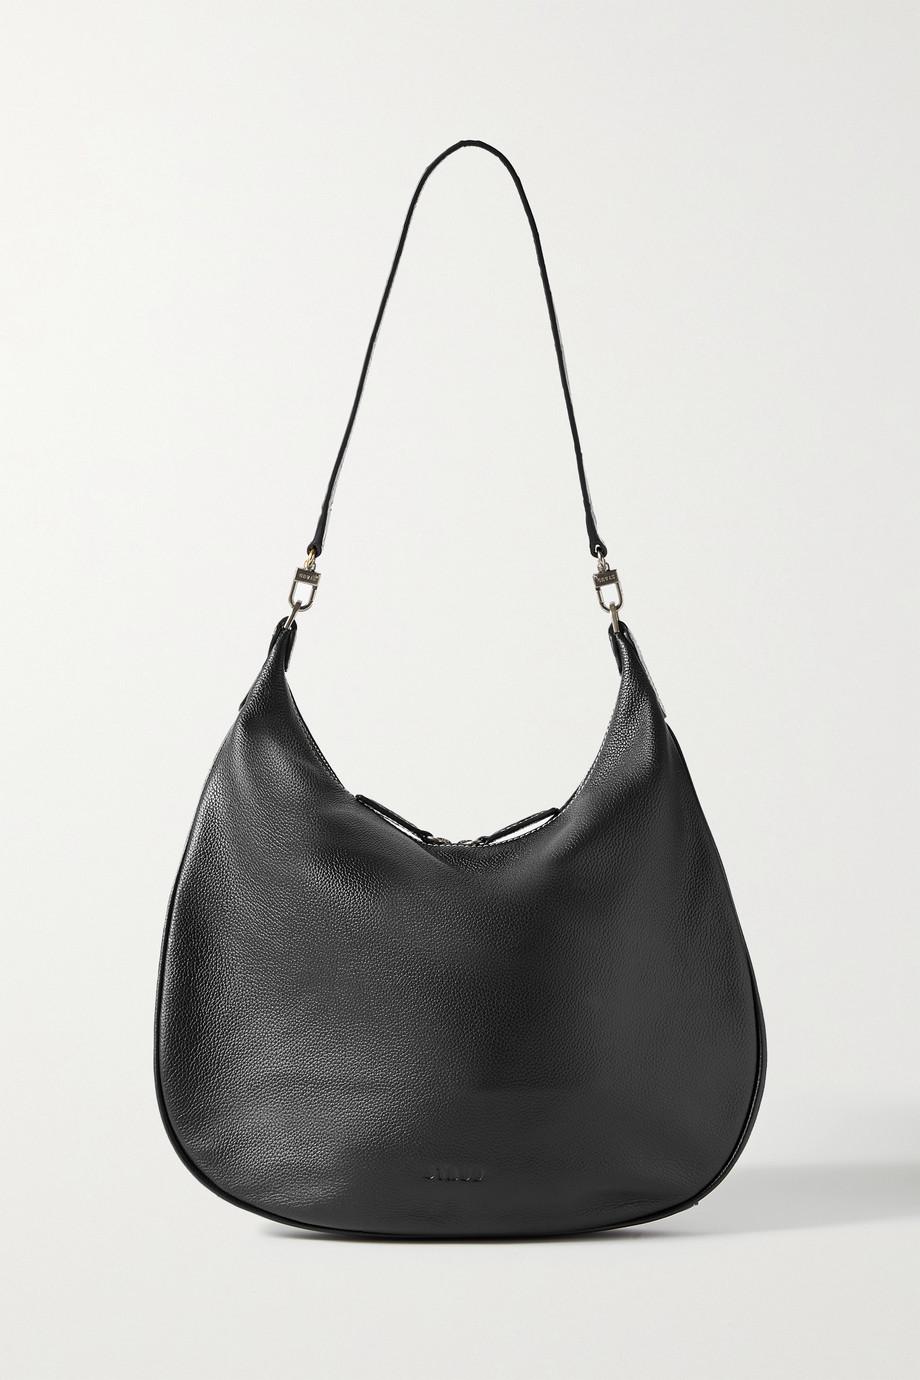 STAUD West textured-leather shoulder bag